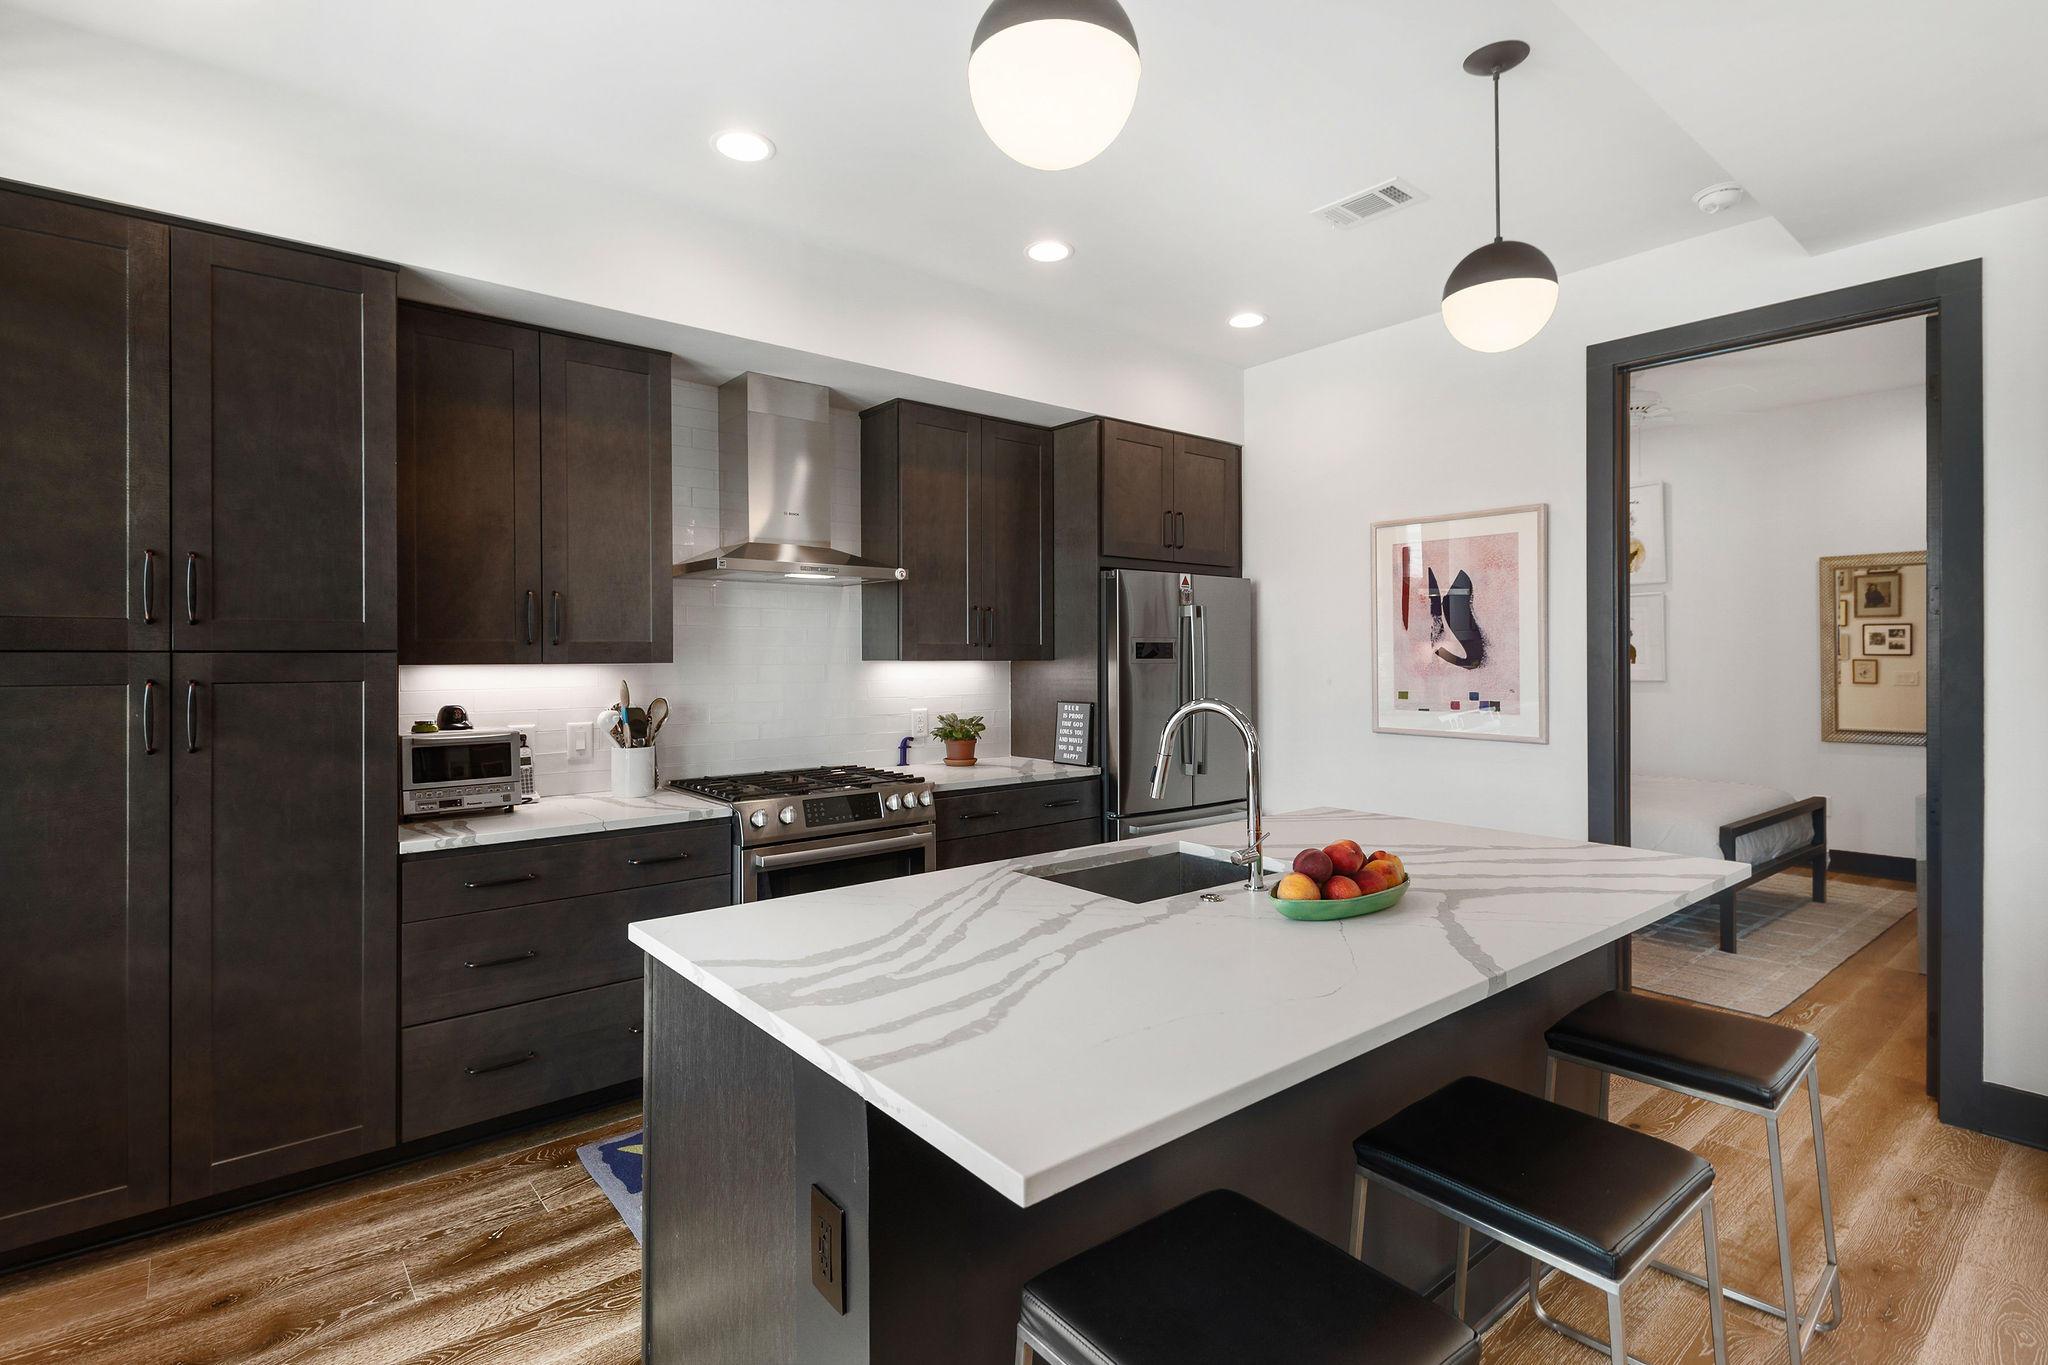 Gadsdenboro Homes For Sale - 5 Gadsdenboro, Charleston, SC - 27